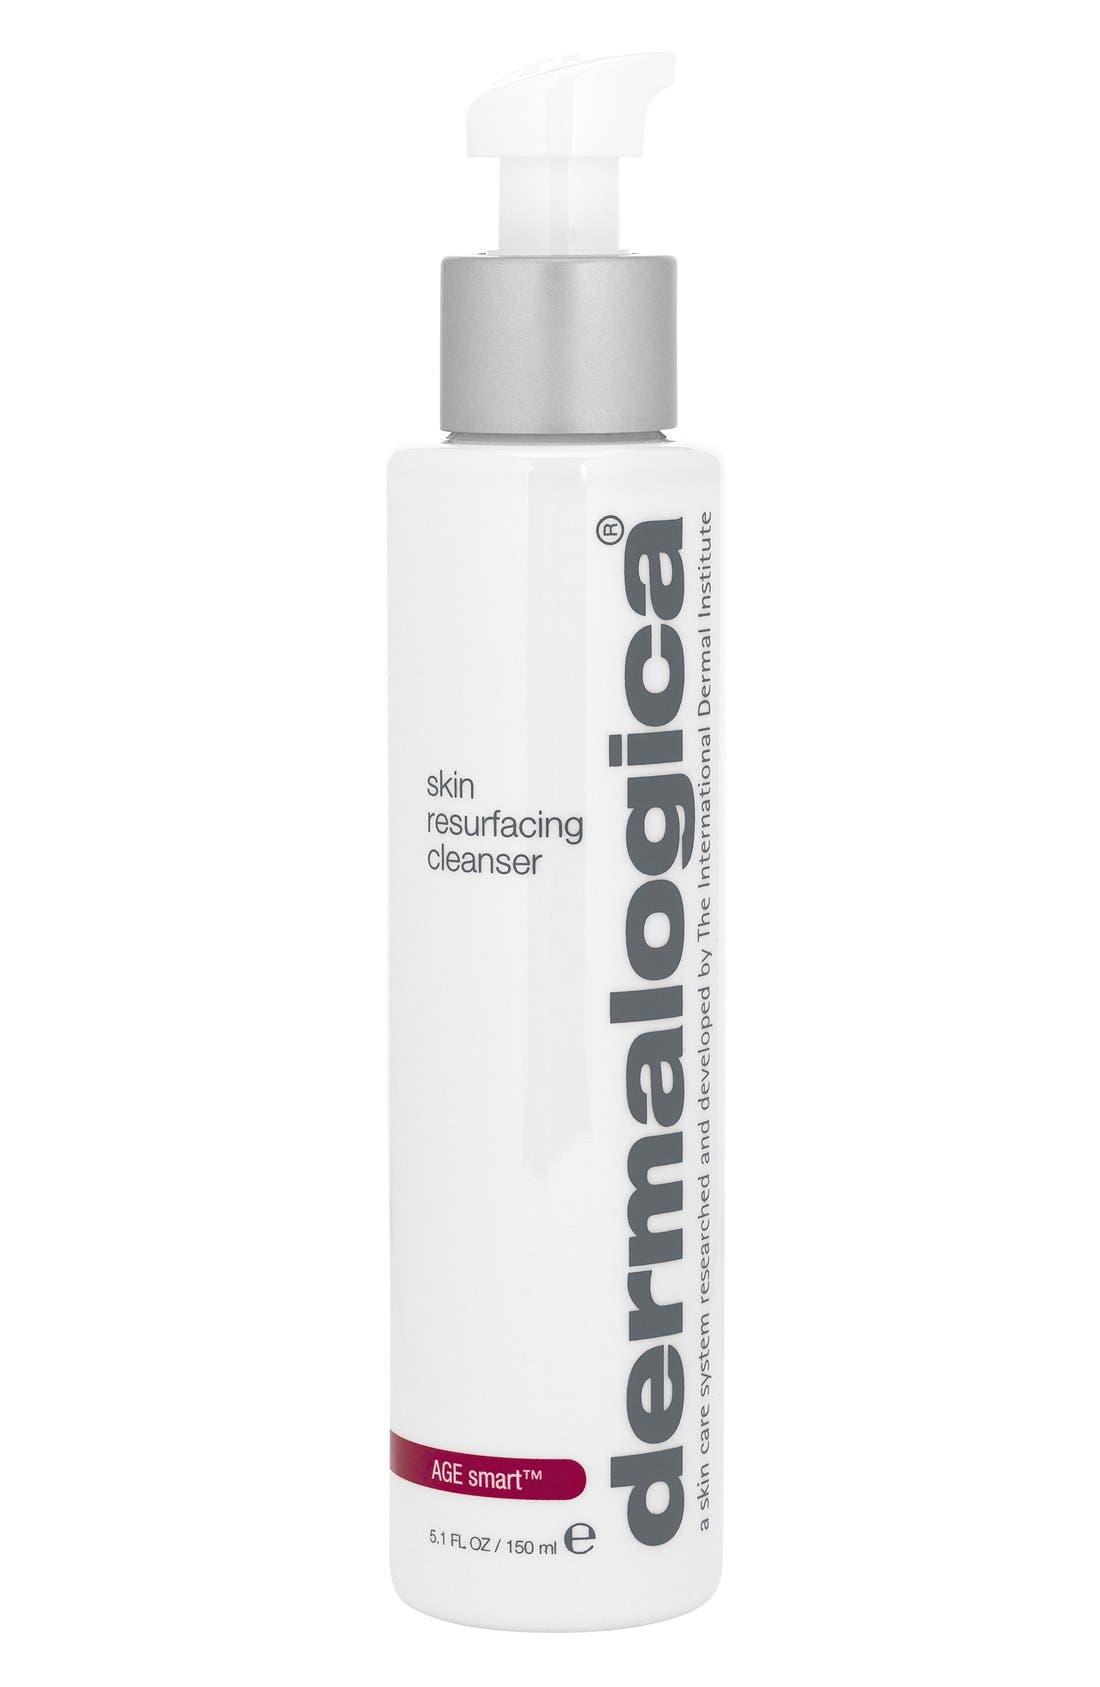 dermalogica® Skin Resurfacing Cleanser